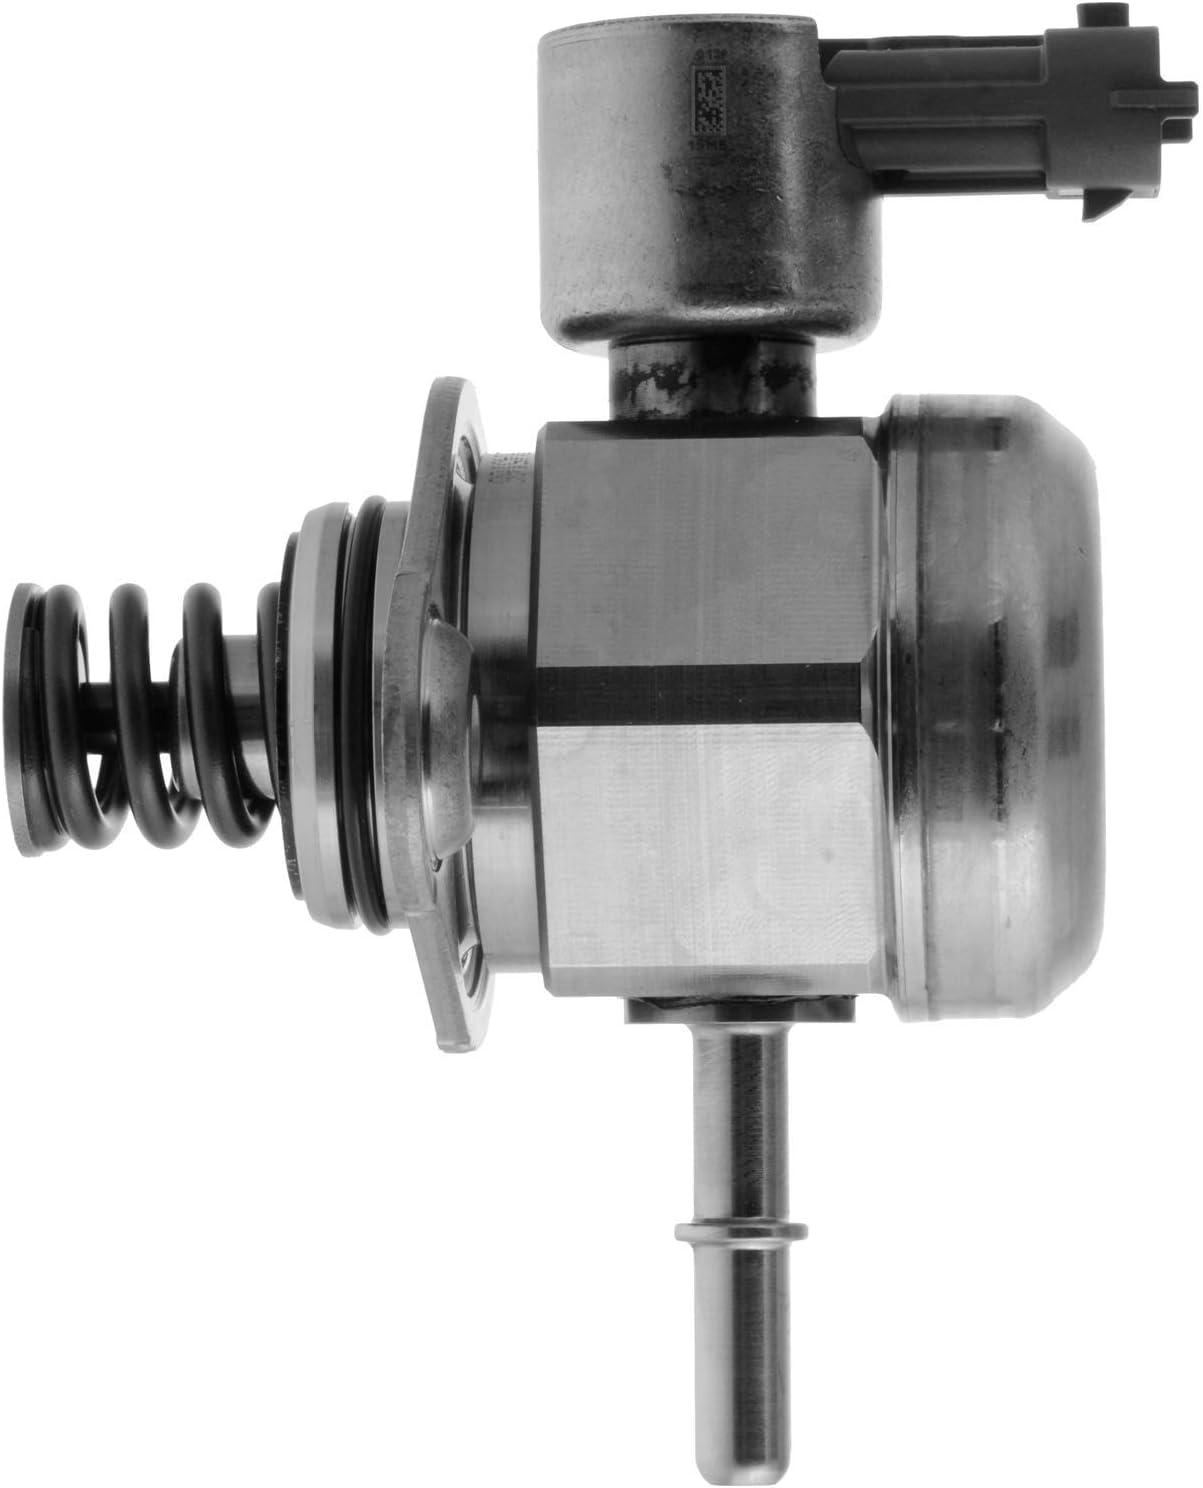 Bosch 66800 GDI Super intense safety SALE High Pressure Fuel Edge for 2012-17 Ford: Pump